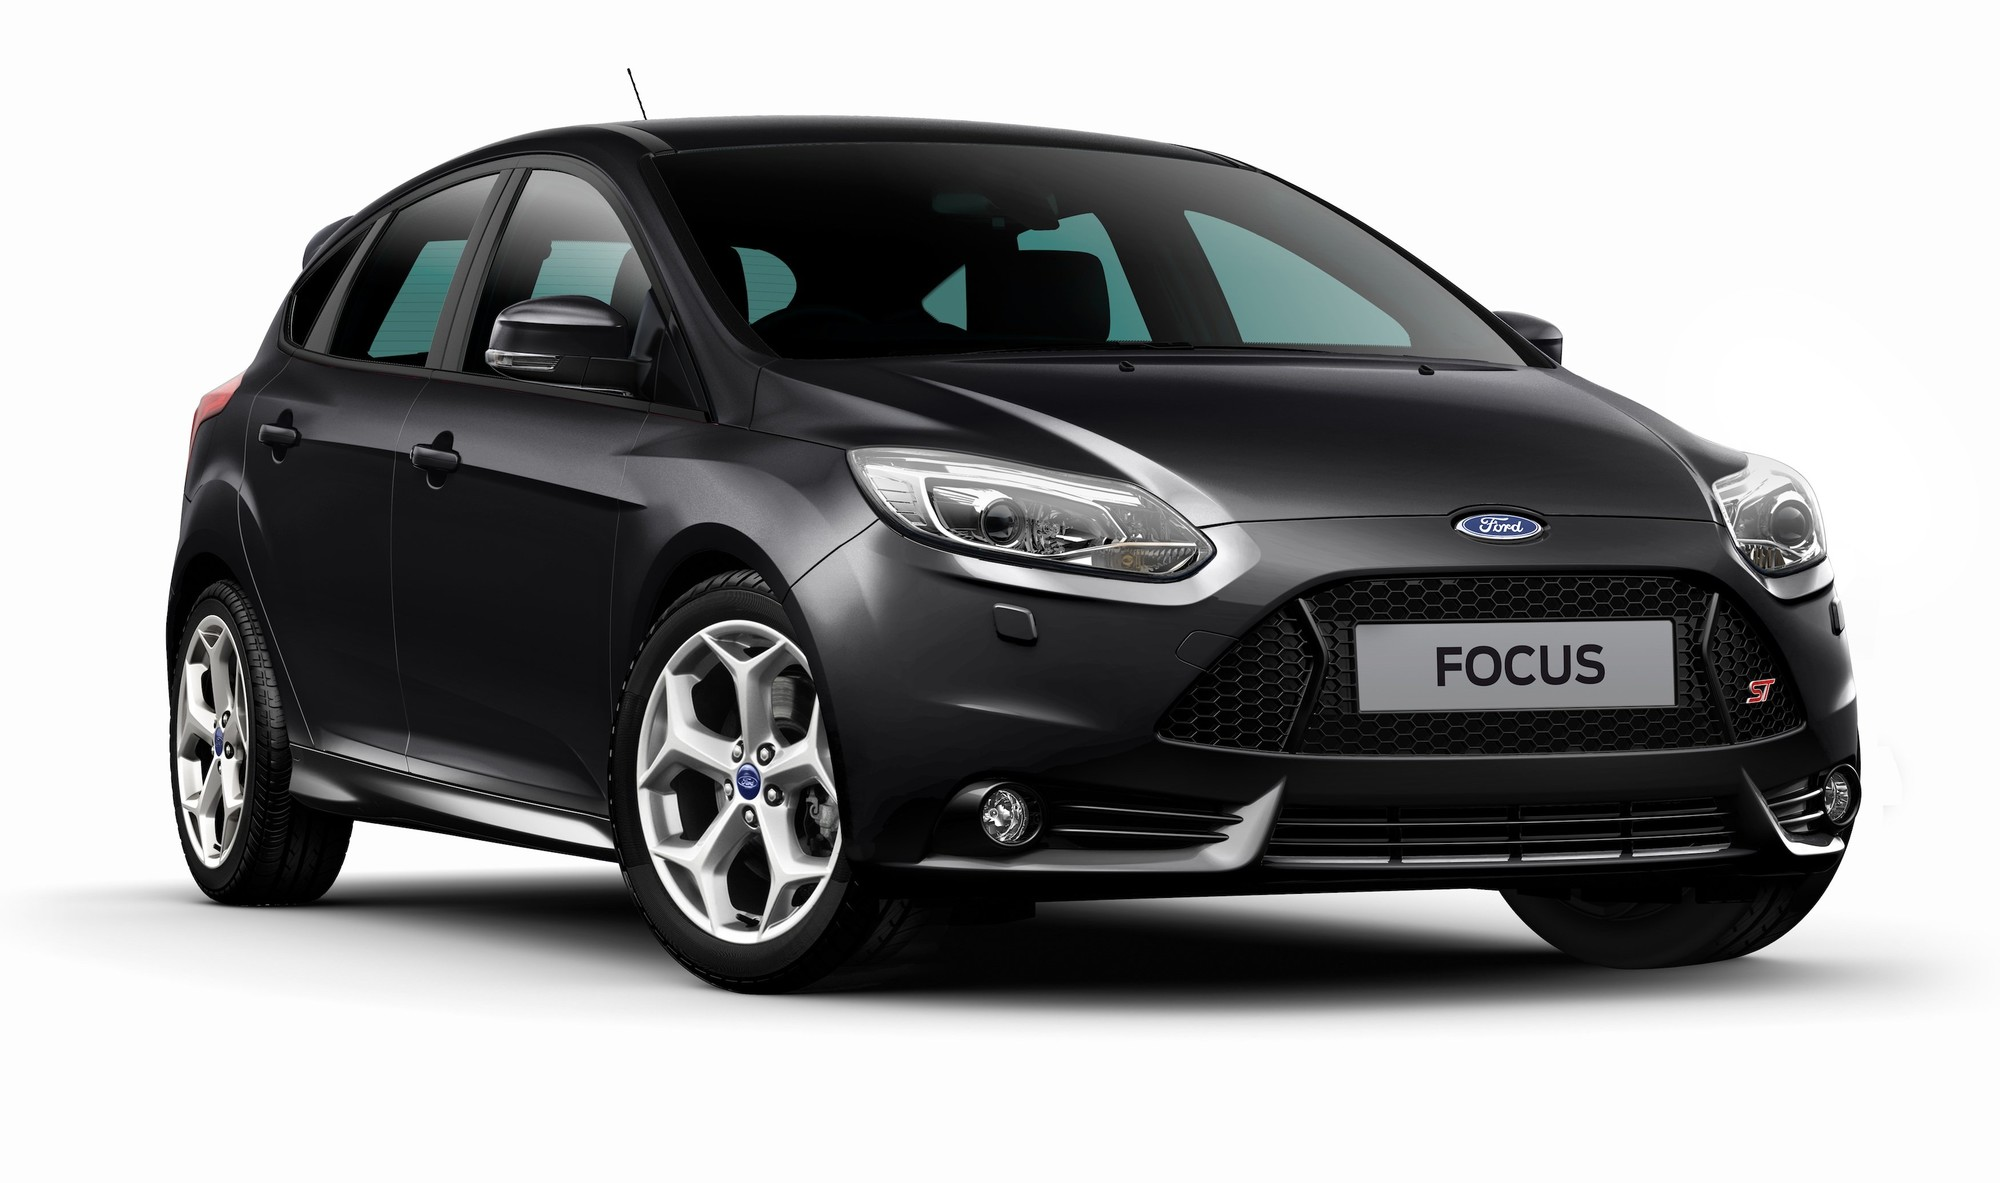 Chiptuning Ford Focus III 1.6 TDCI 95 pk 95 gram CO2